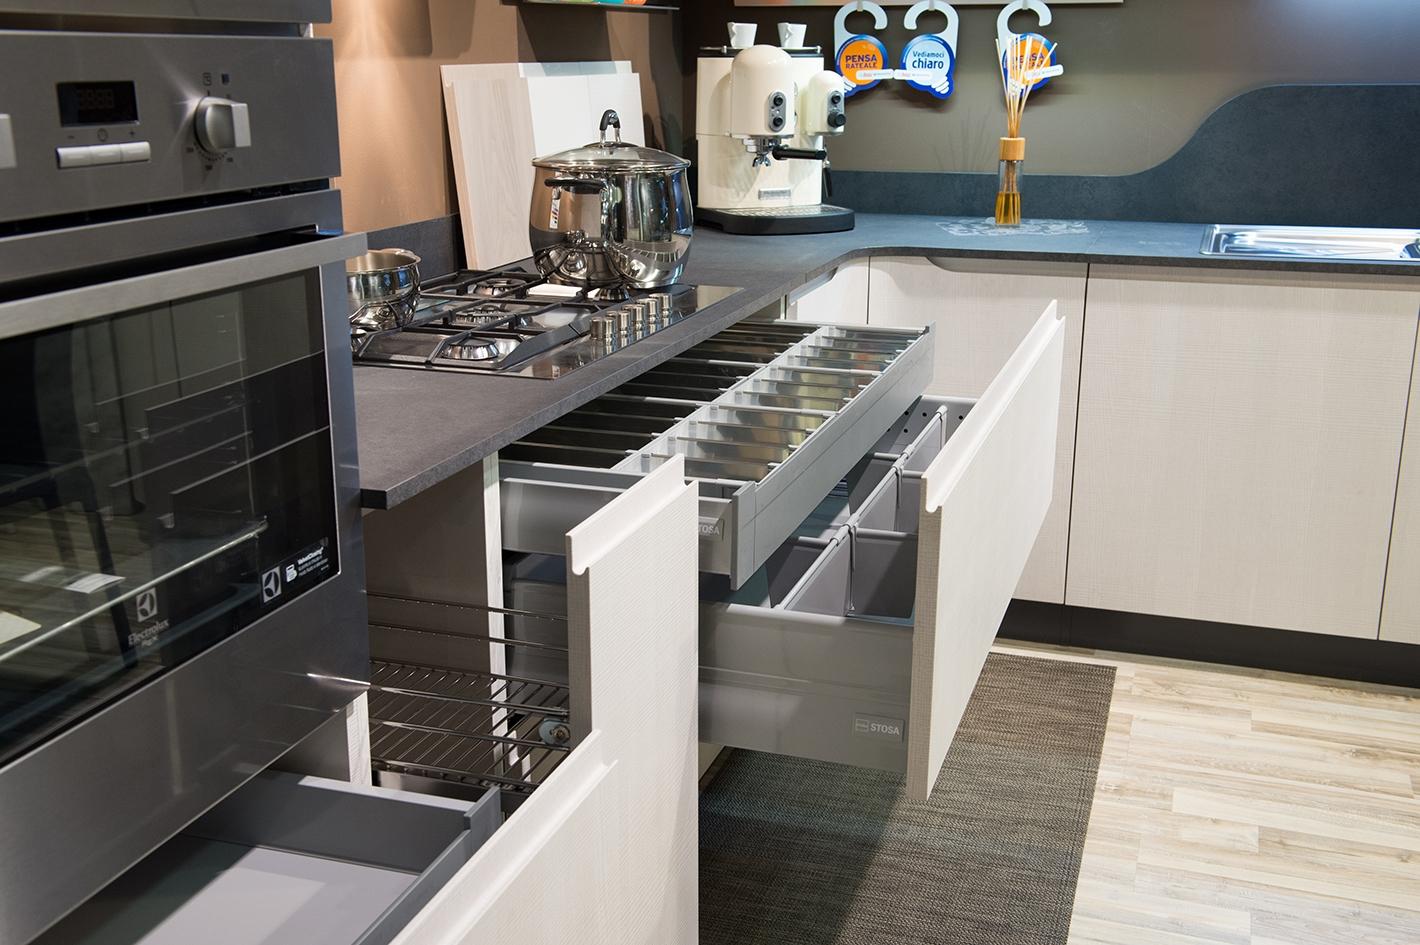 Cucina stosa mod bring completa di elettrodomestici 19270 - Elettrodomestici in cucina ...